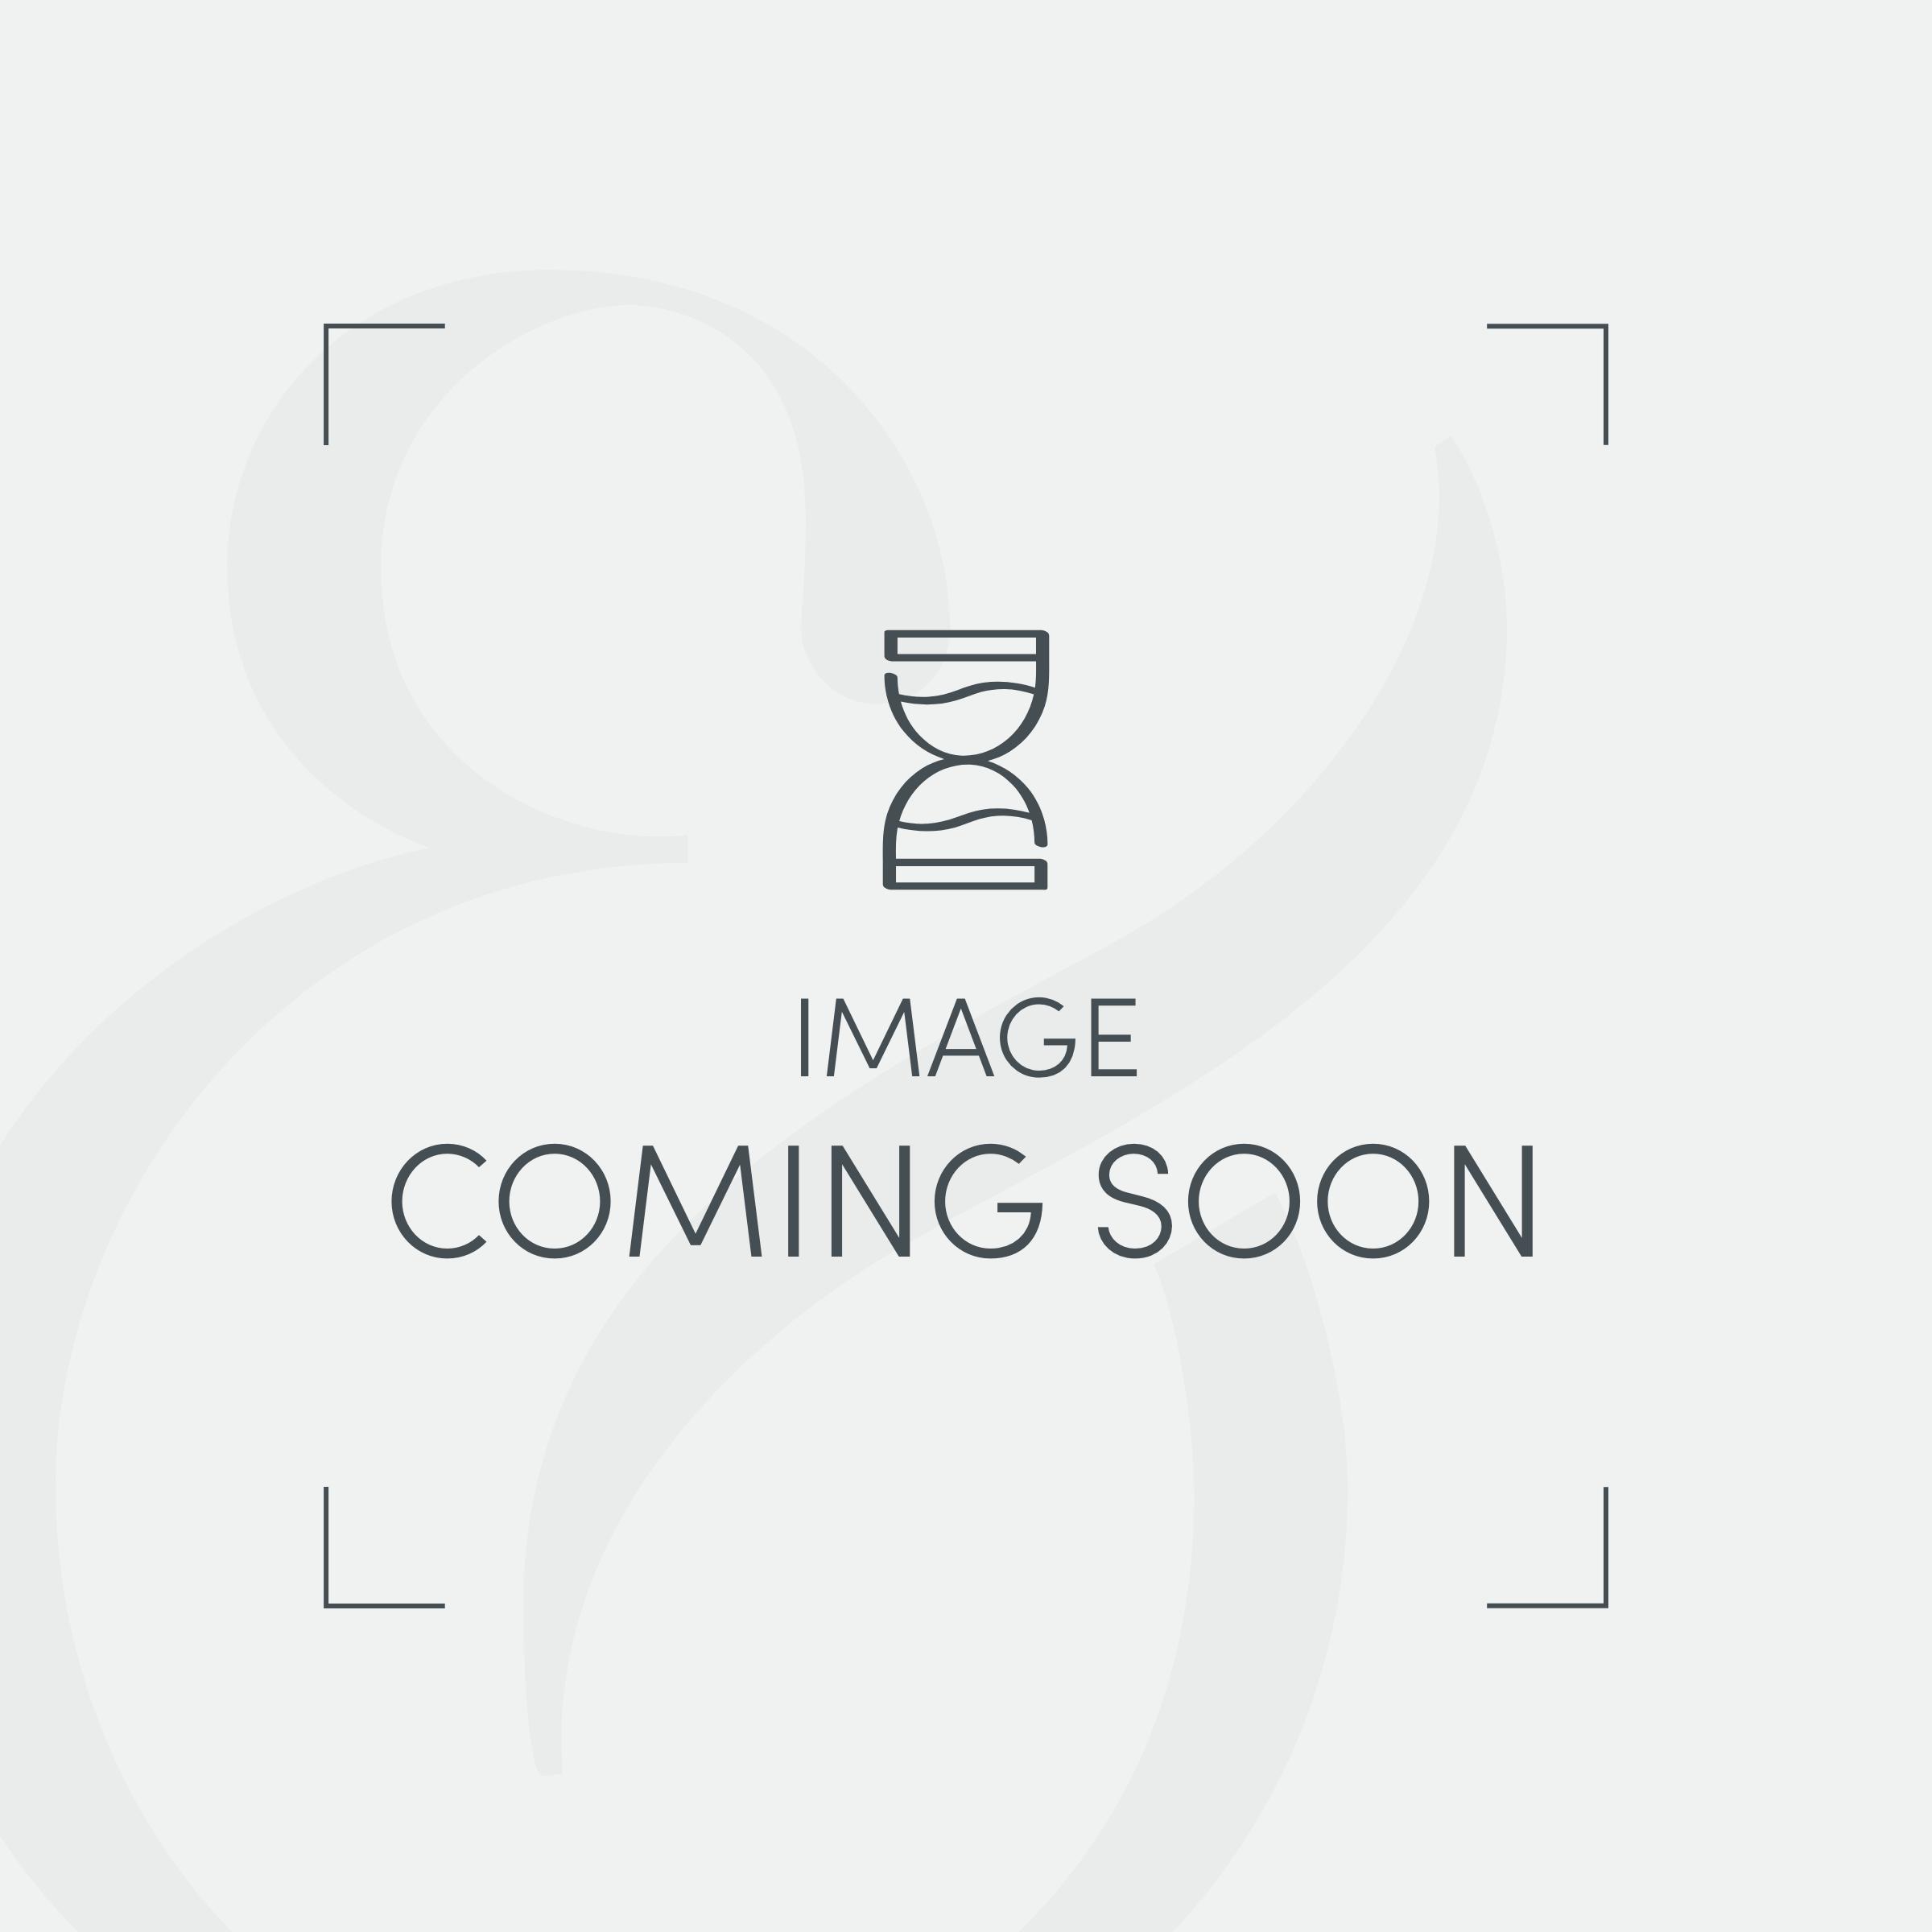 Special Buy 400TC Dobby Stripe - 2 x Standard Housewife Pillowcases - White